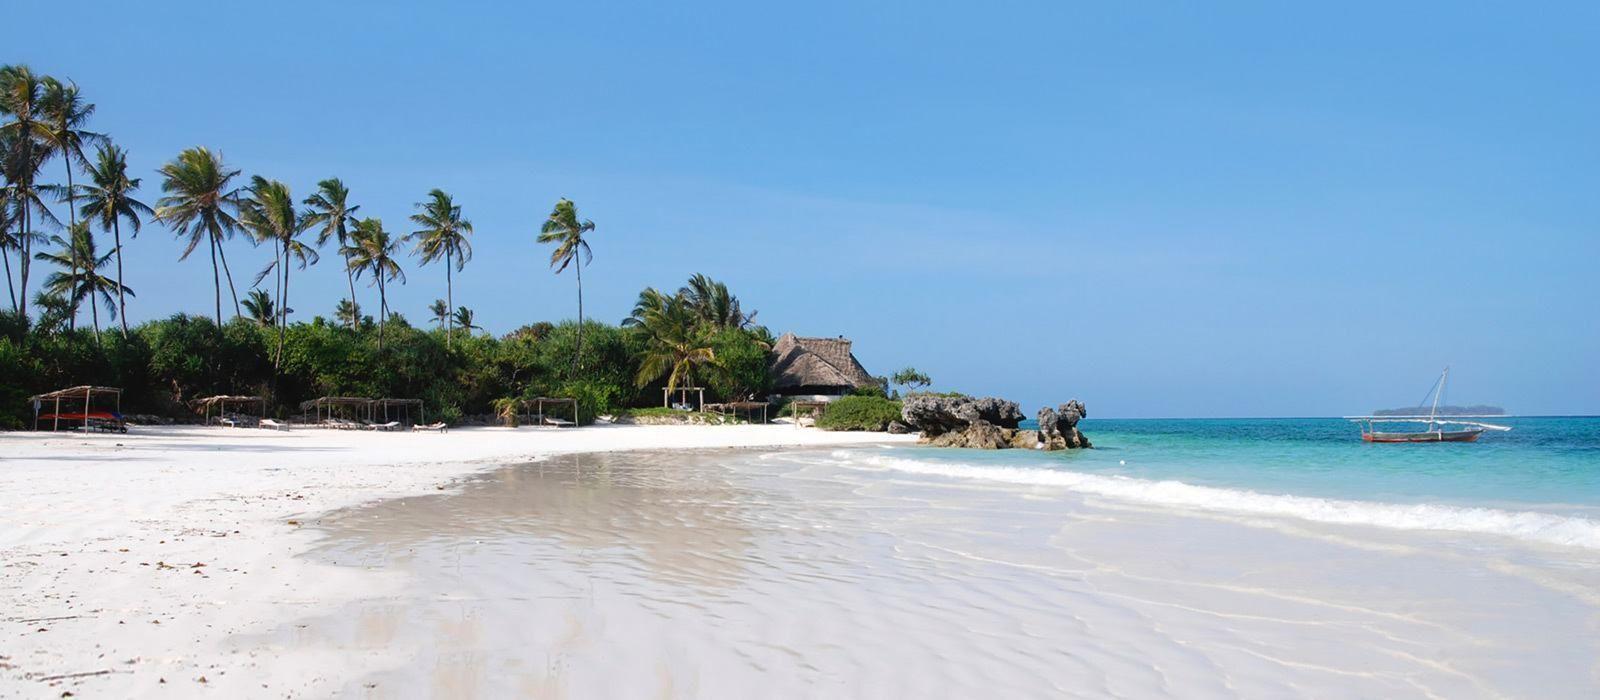 Destination Dar es Salaam Tanzania